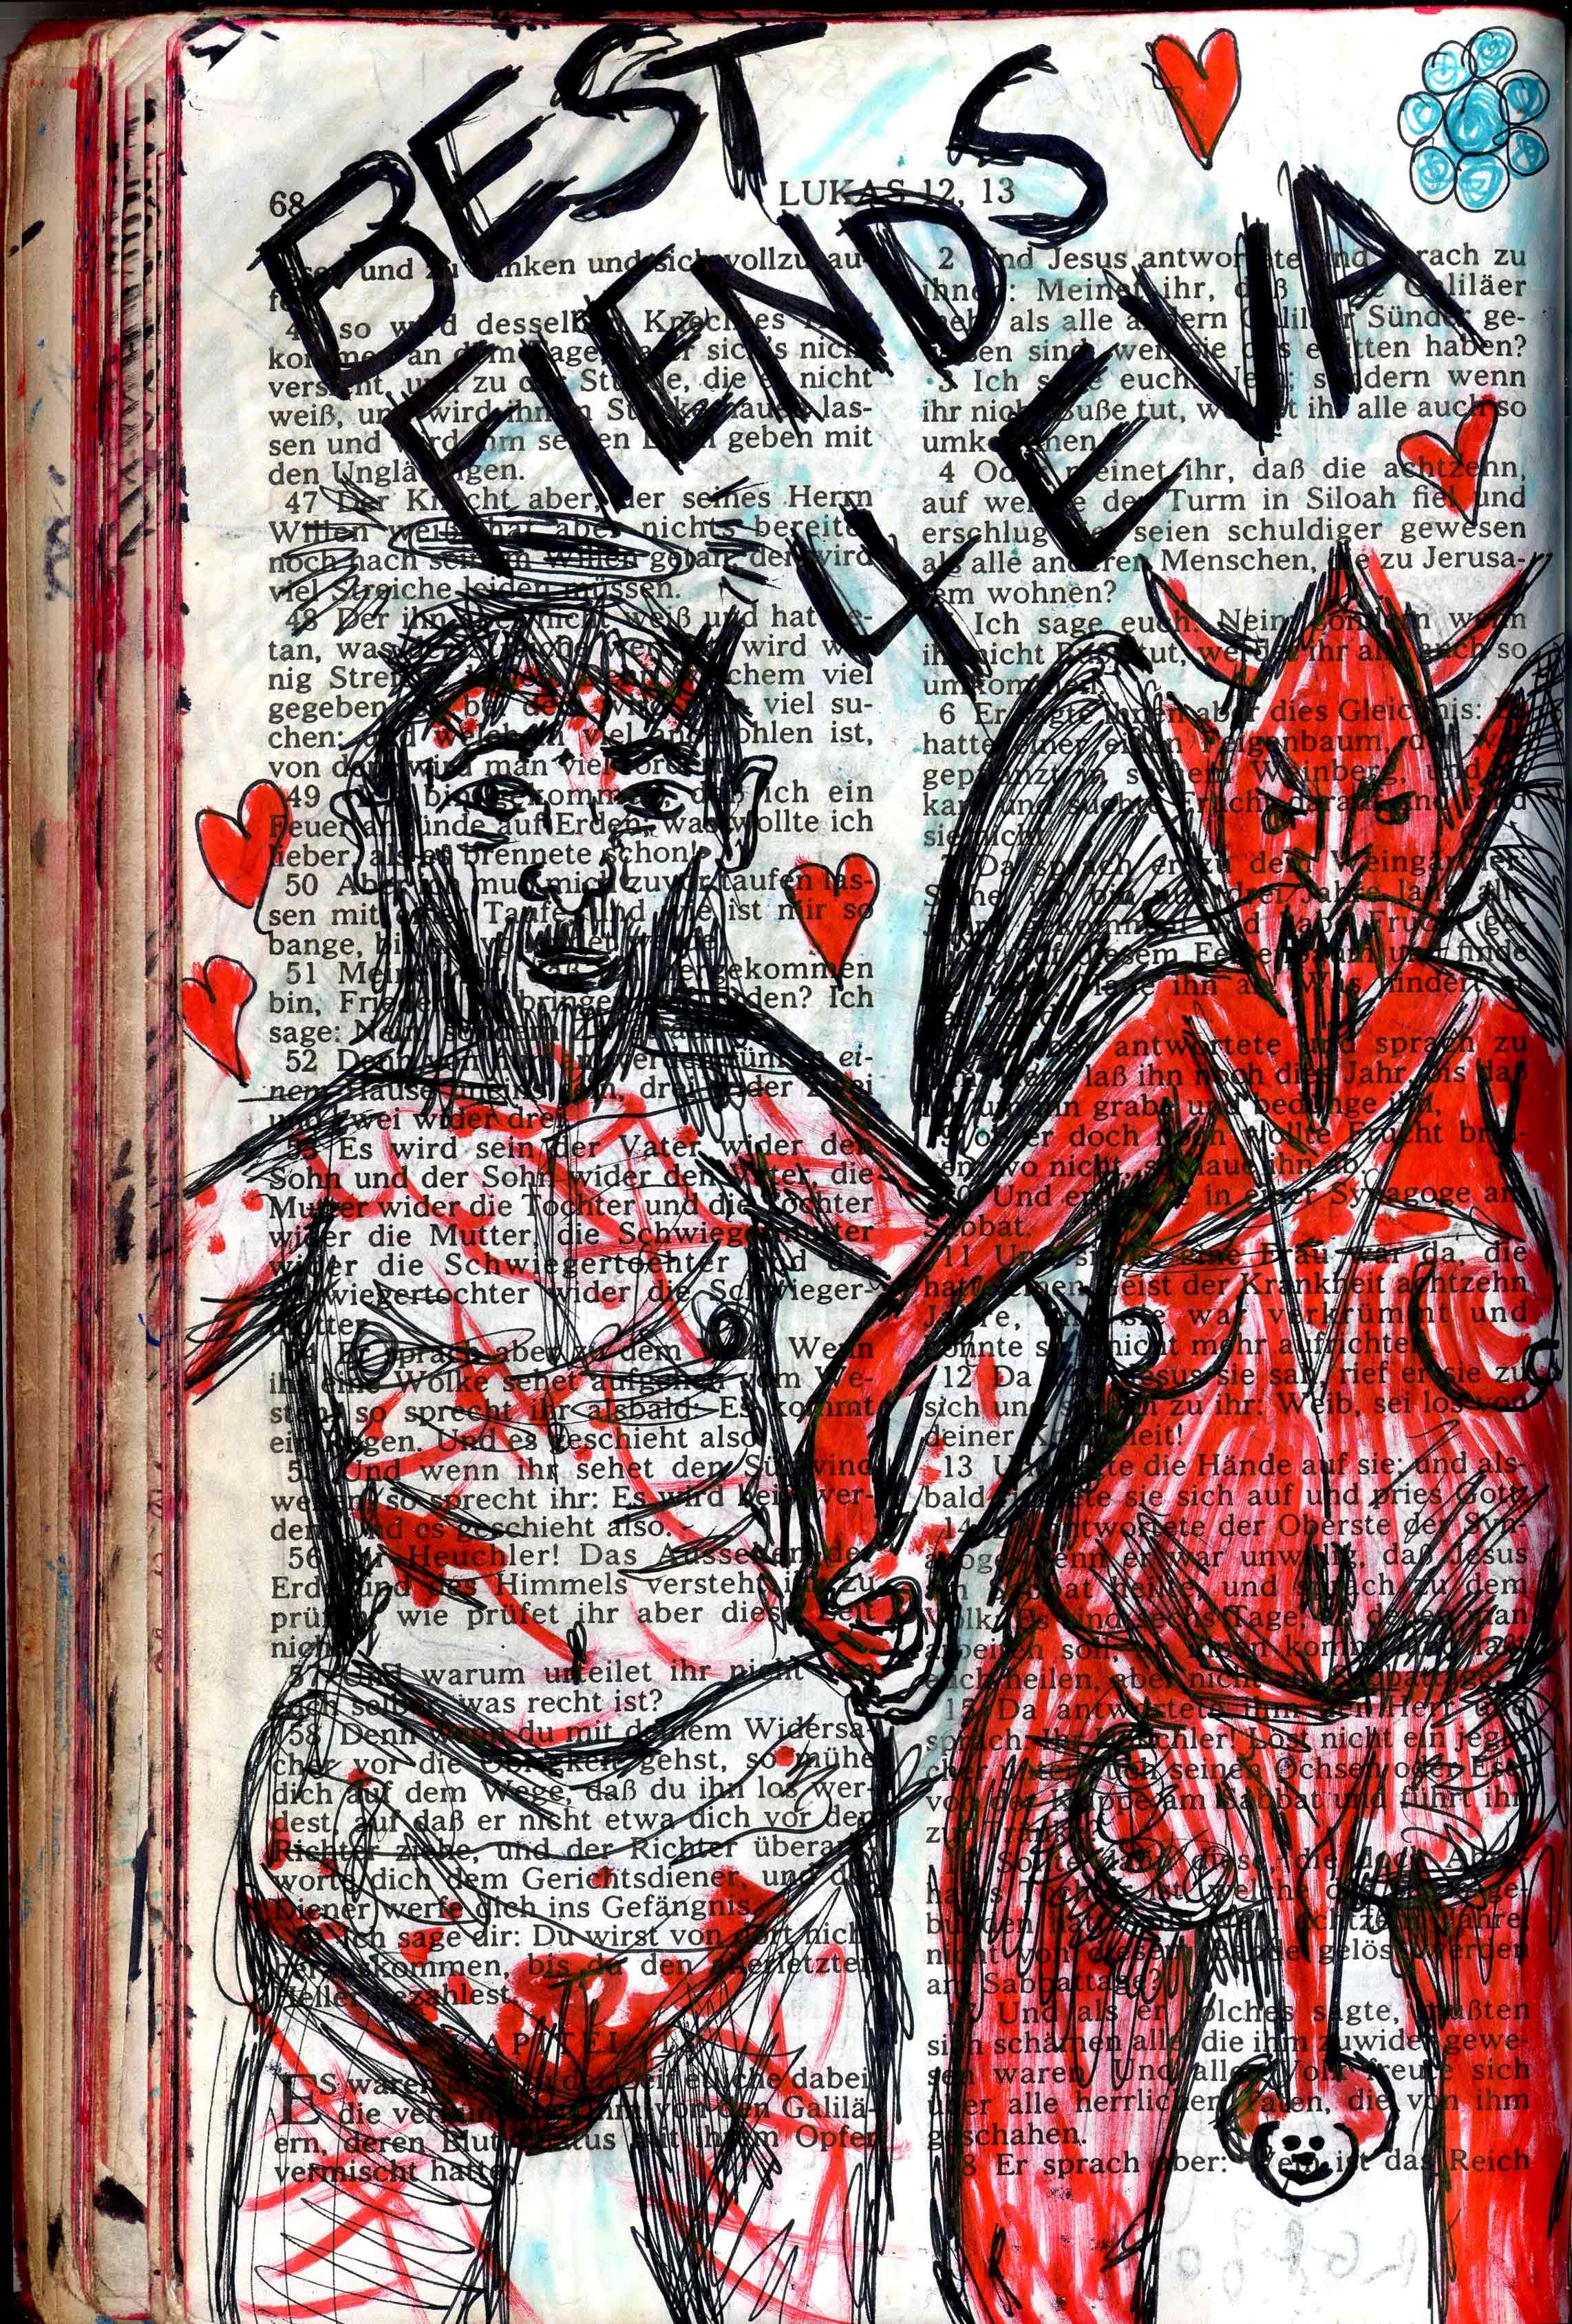 bible-53